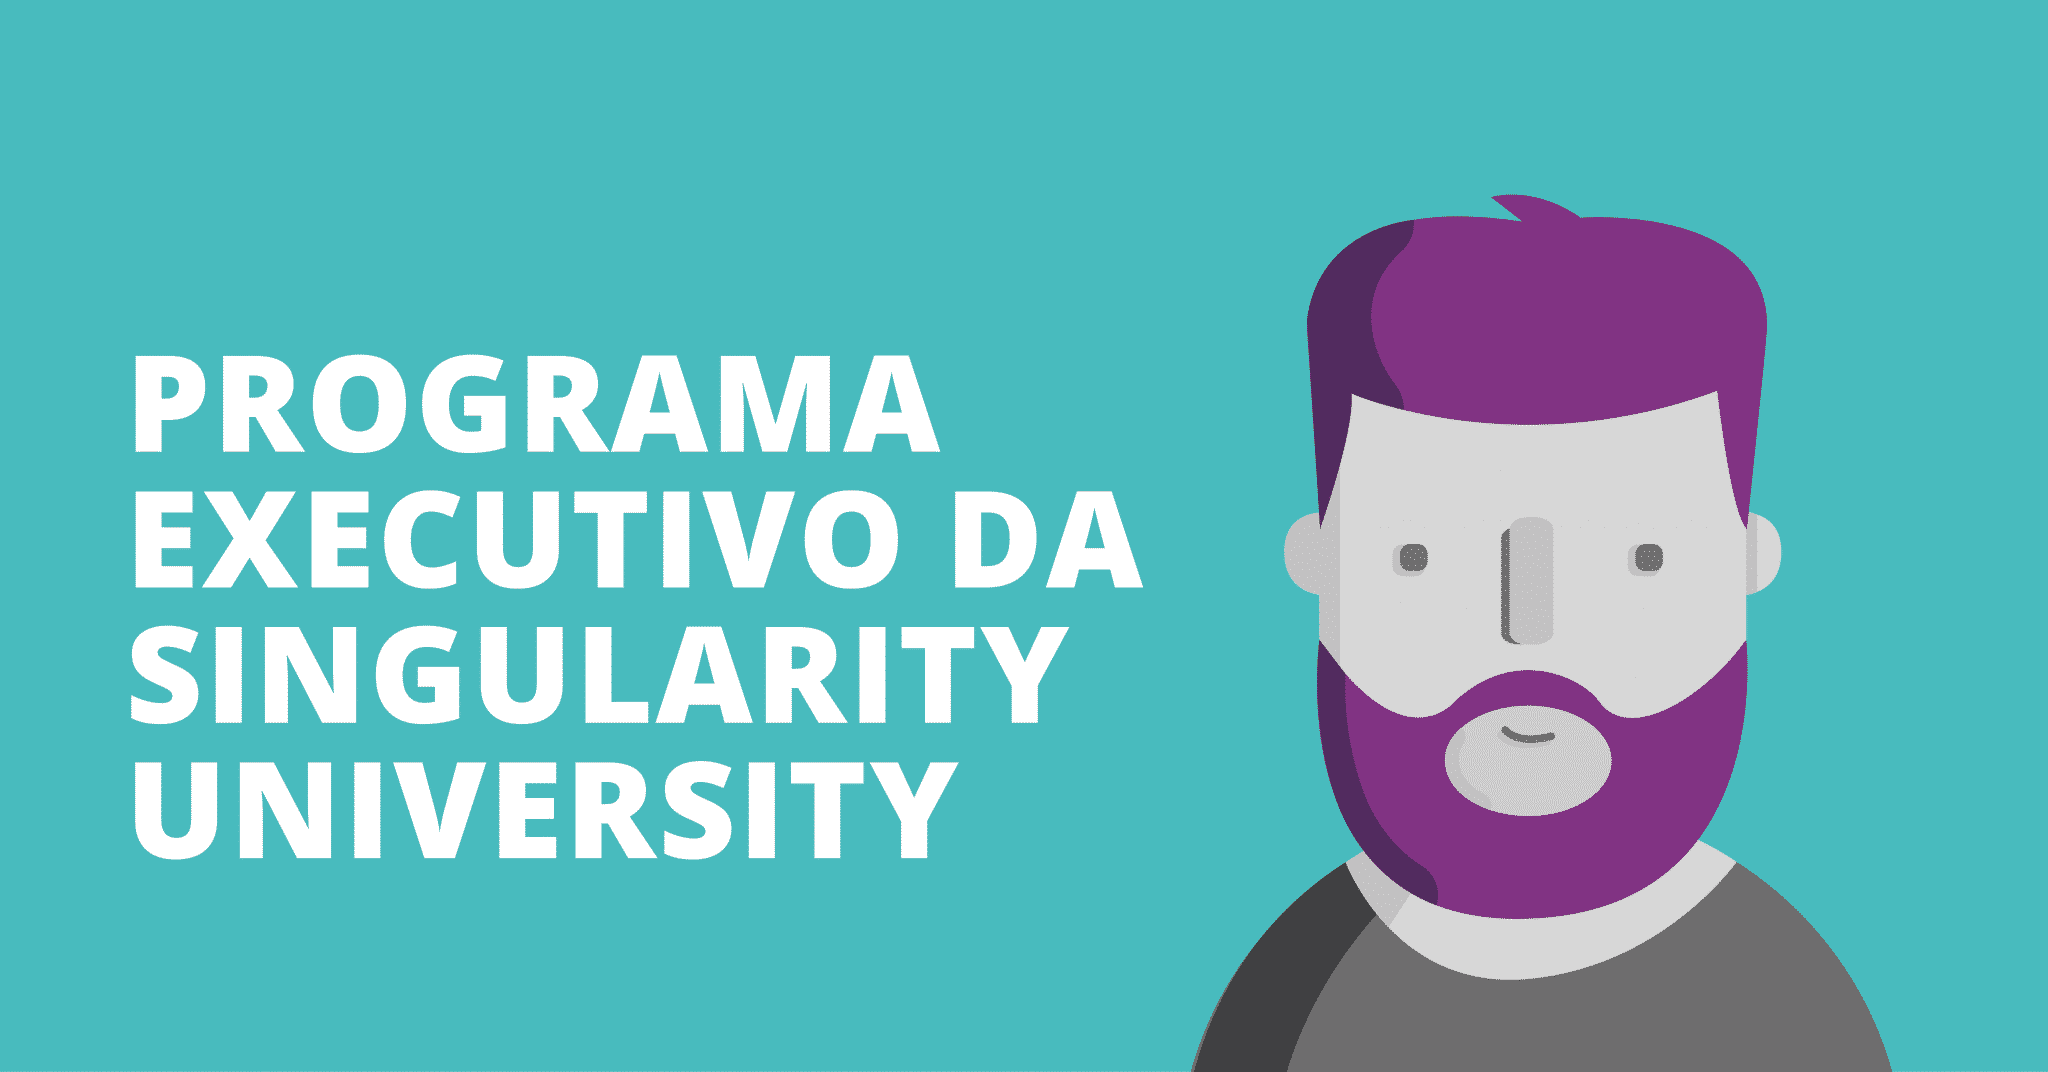 Programa Executivo da Singularity University